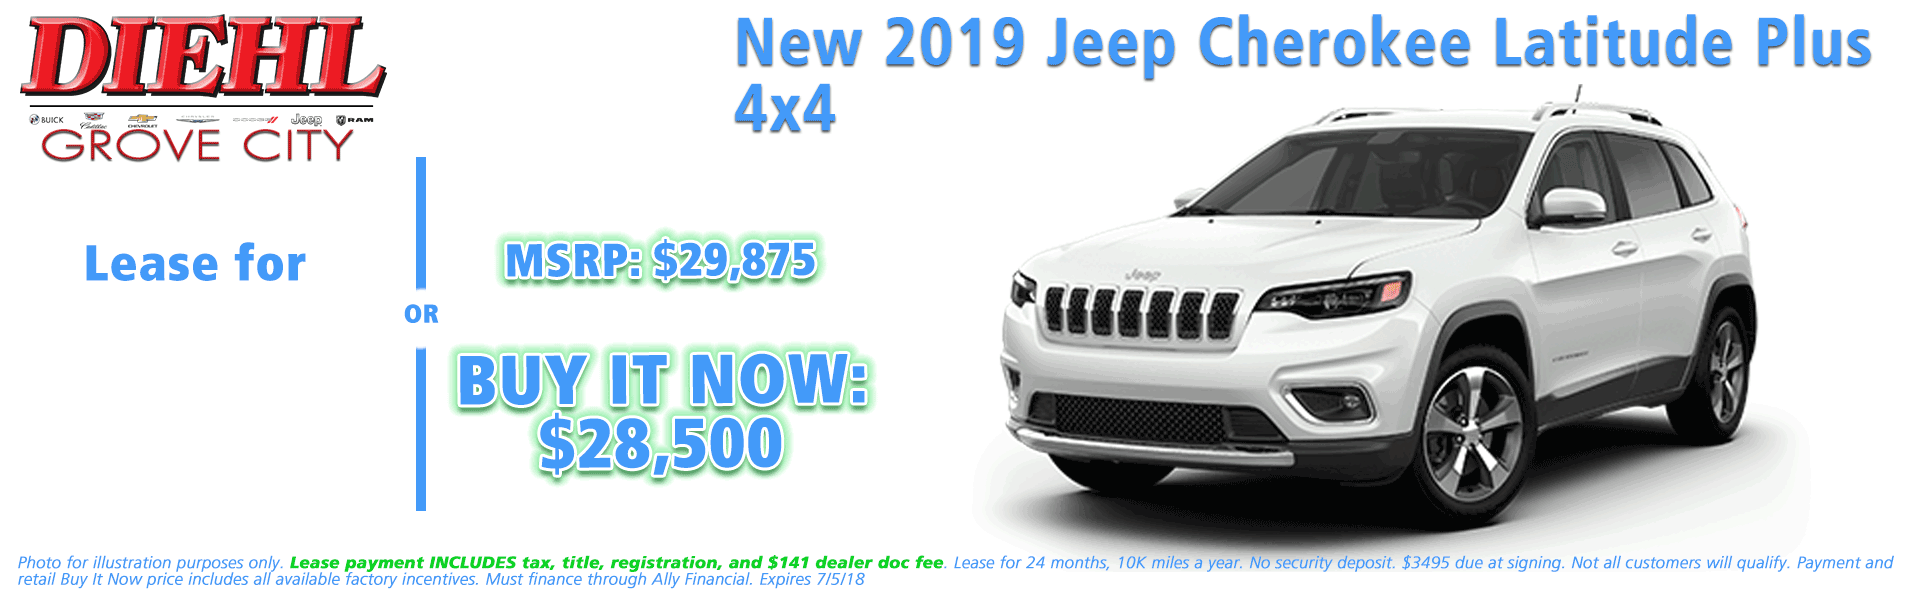 NEW 2019 JEEP CHEROKEE LATITUDE PLUS 4X4 Diehl of Grove City, Pennsylvania. Chrysler Jeep Dodge Ram Chevrolet Buick Cadillac dealership